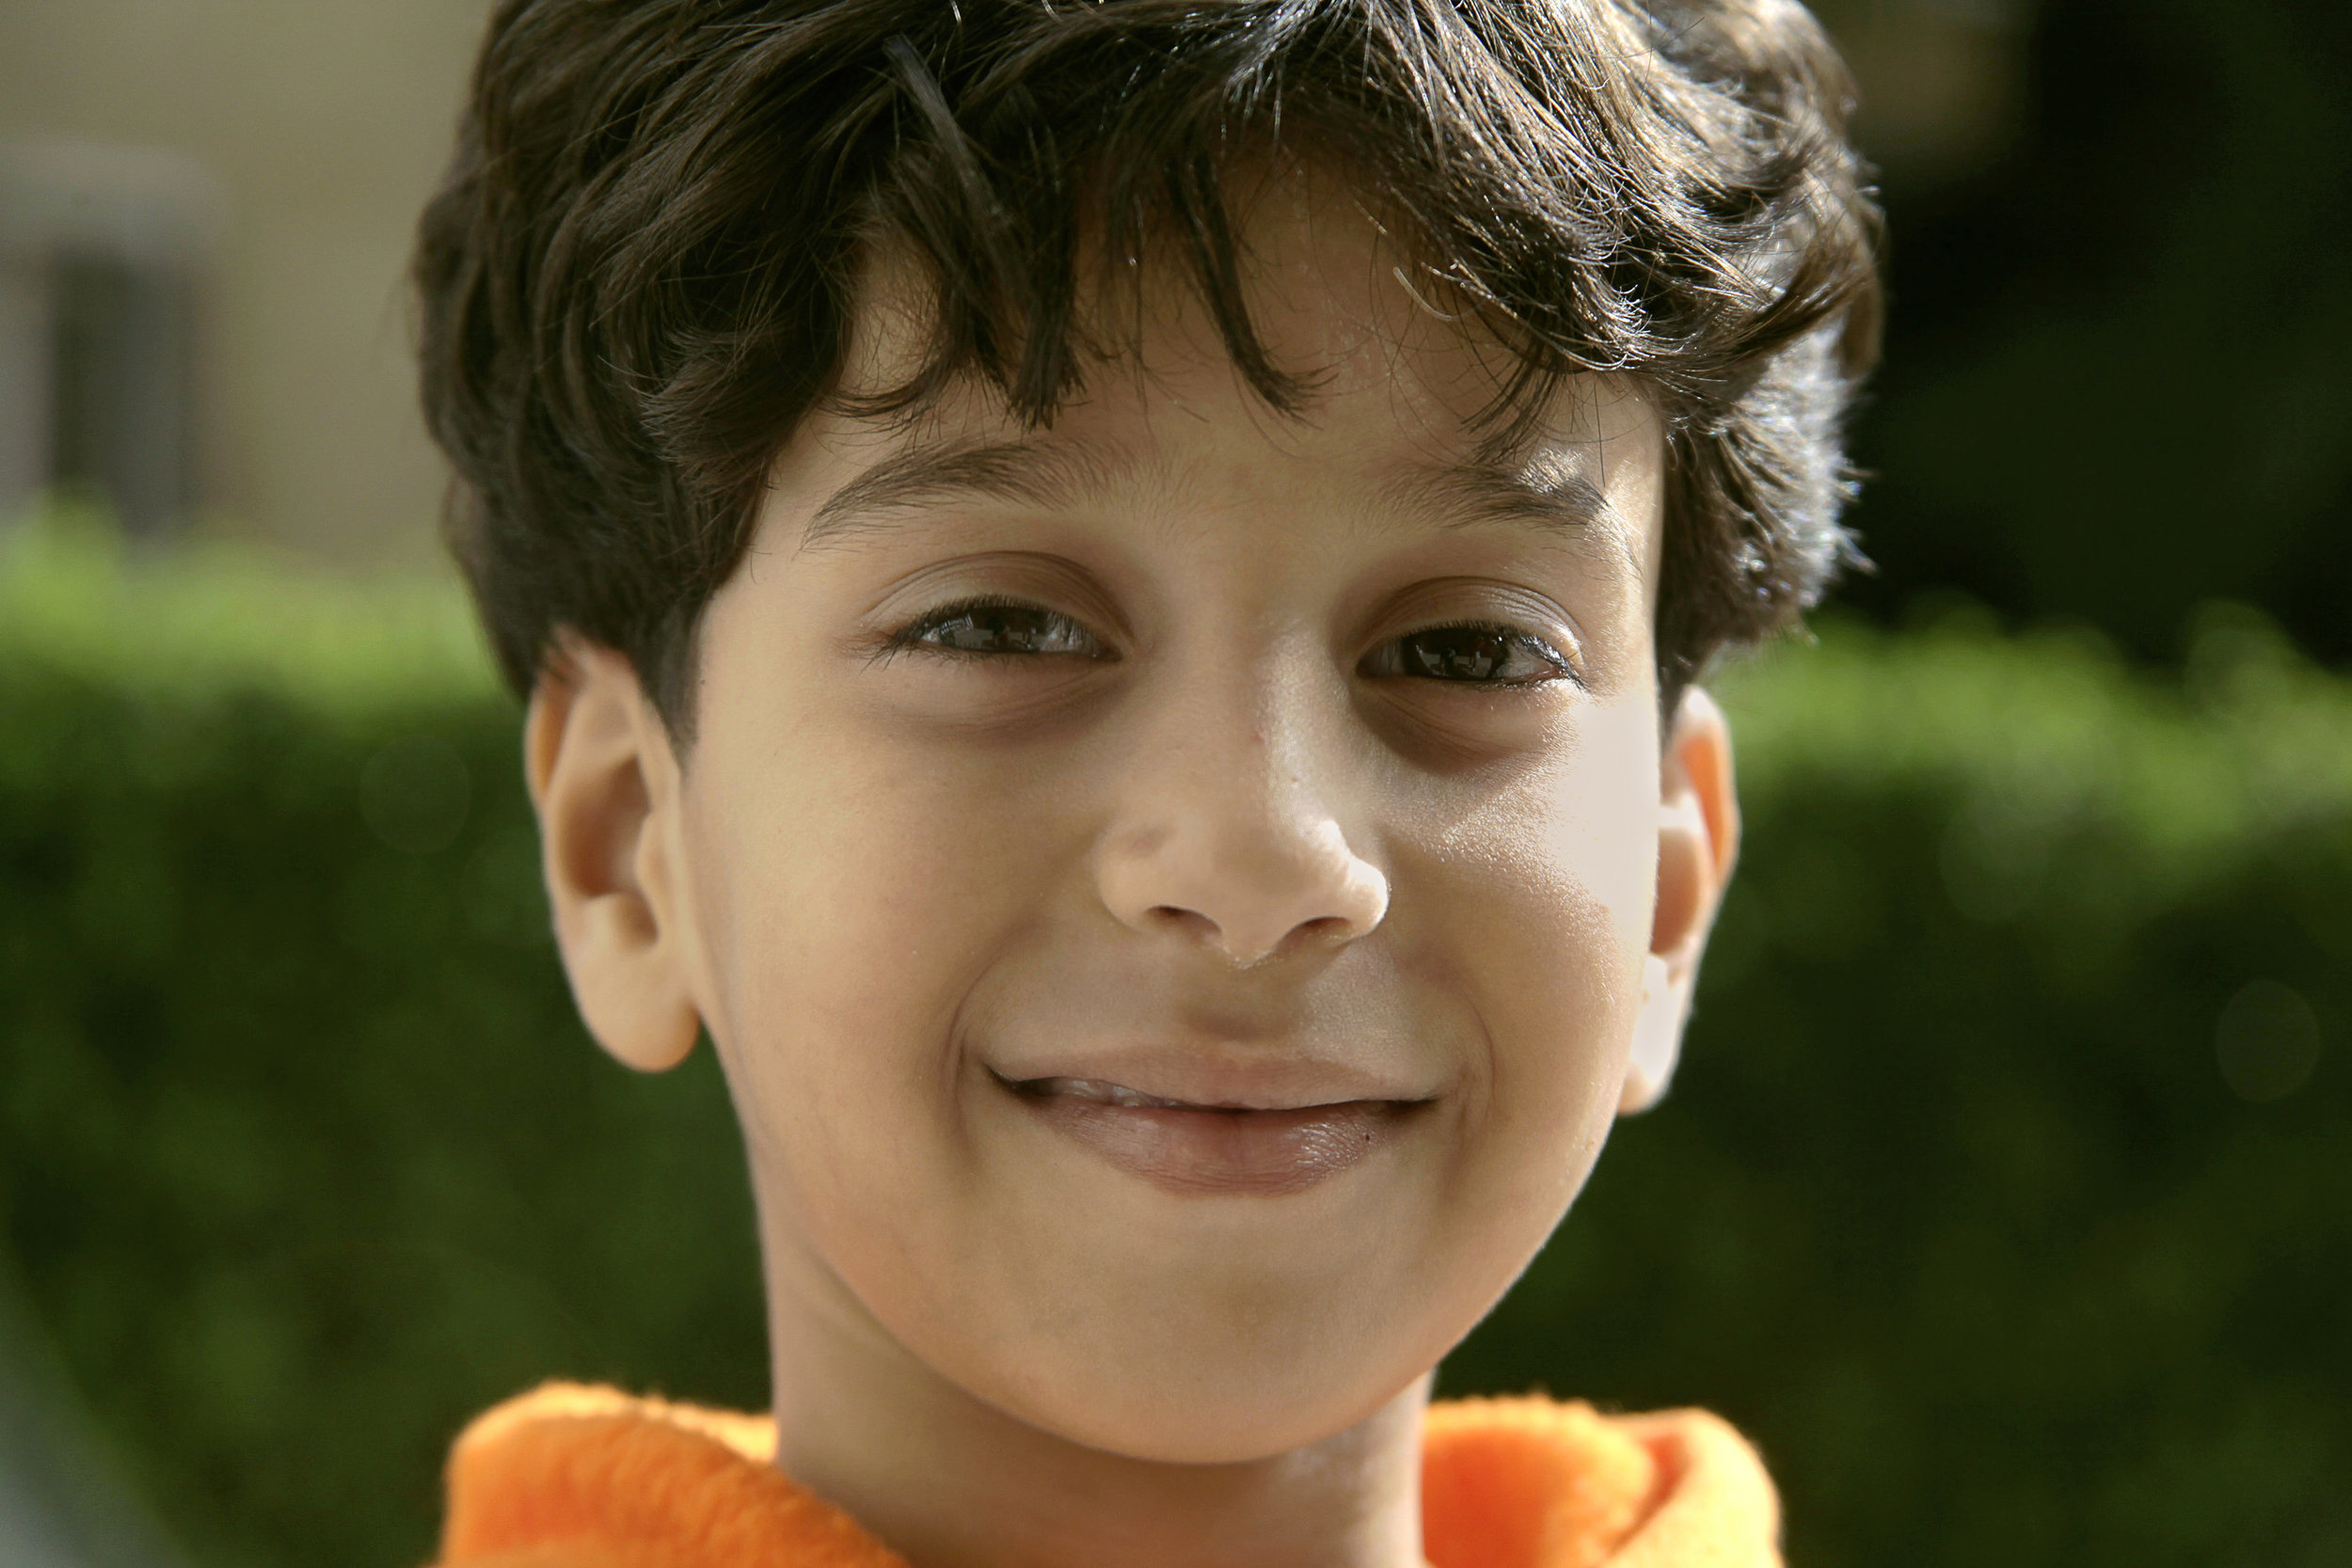 Omar Syrian Palestinian refugee INARA Arwa Damon AUBMC